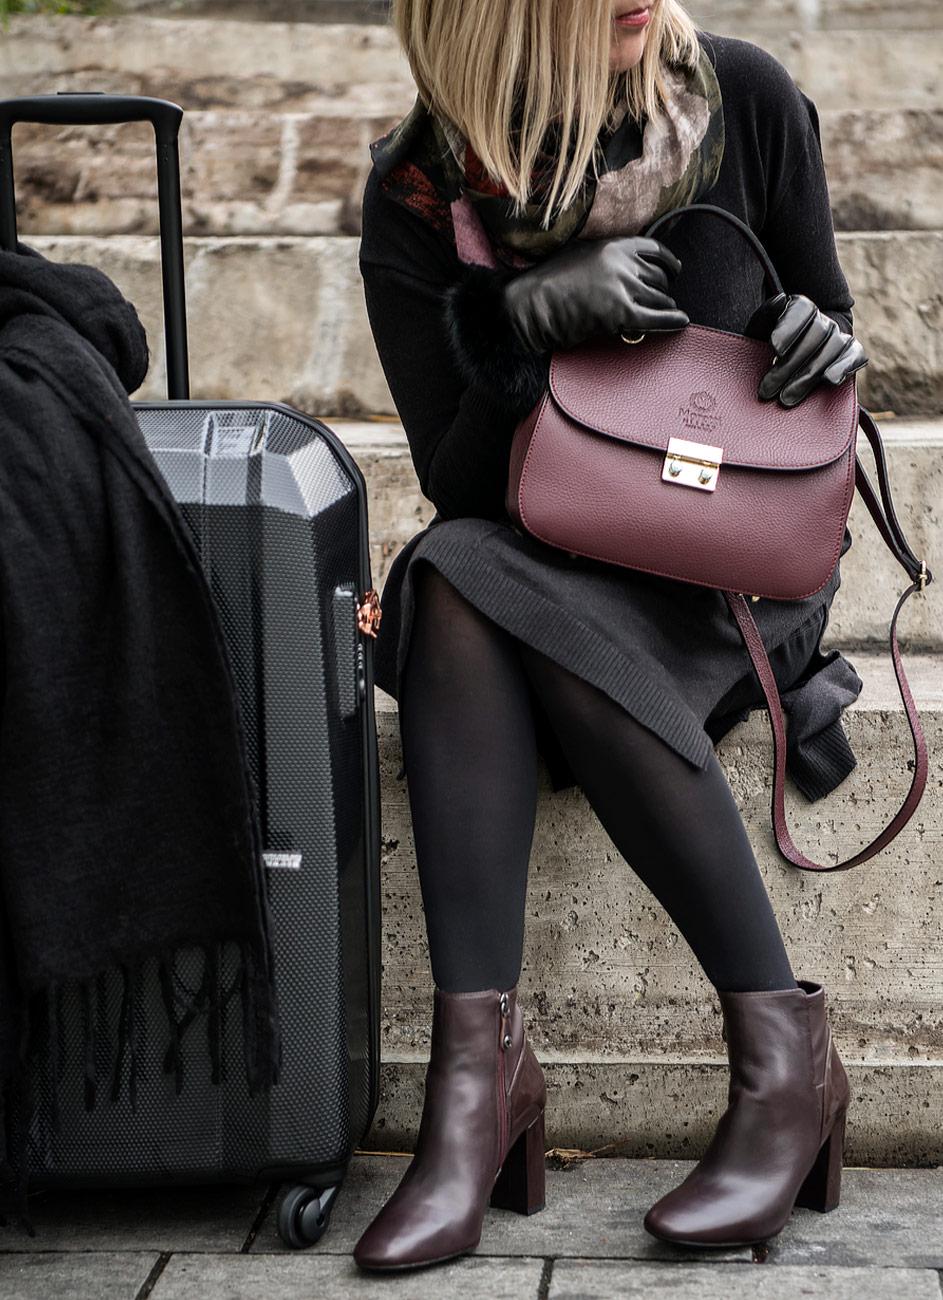 skien By koffertSkien by trend mote veske sko TOkiwPZXu